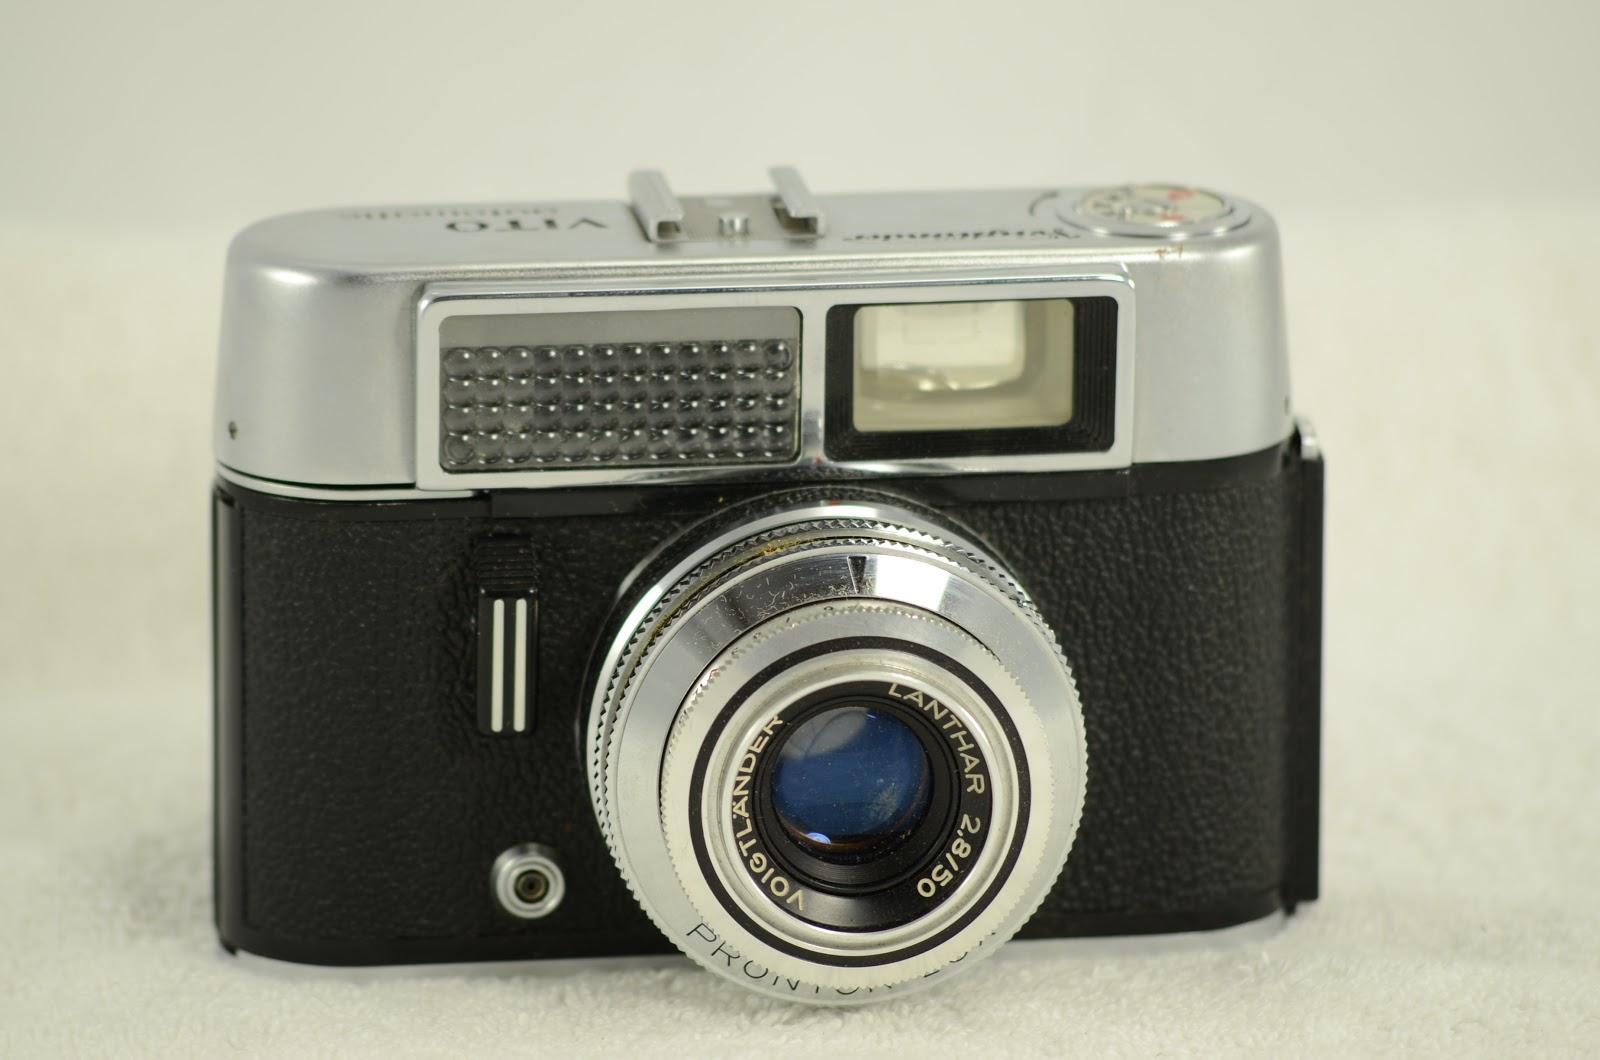 Vintage Camera House: Voigtlander Vitomatic with box